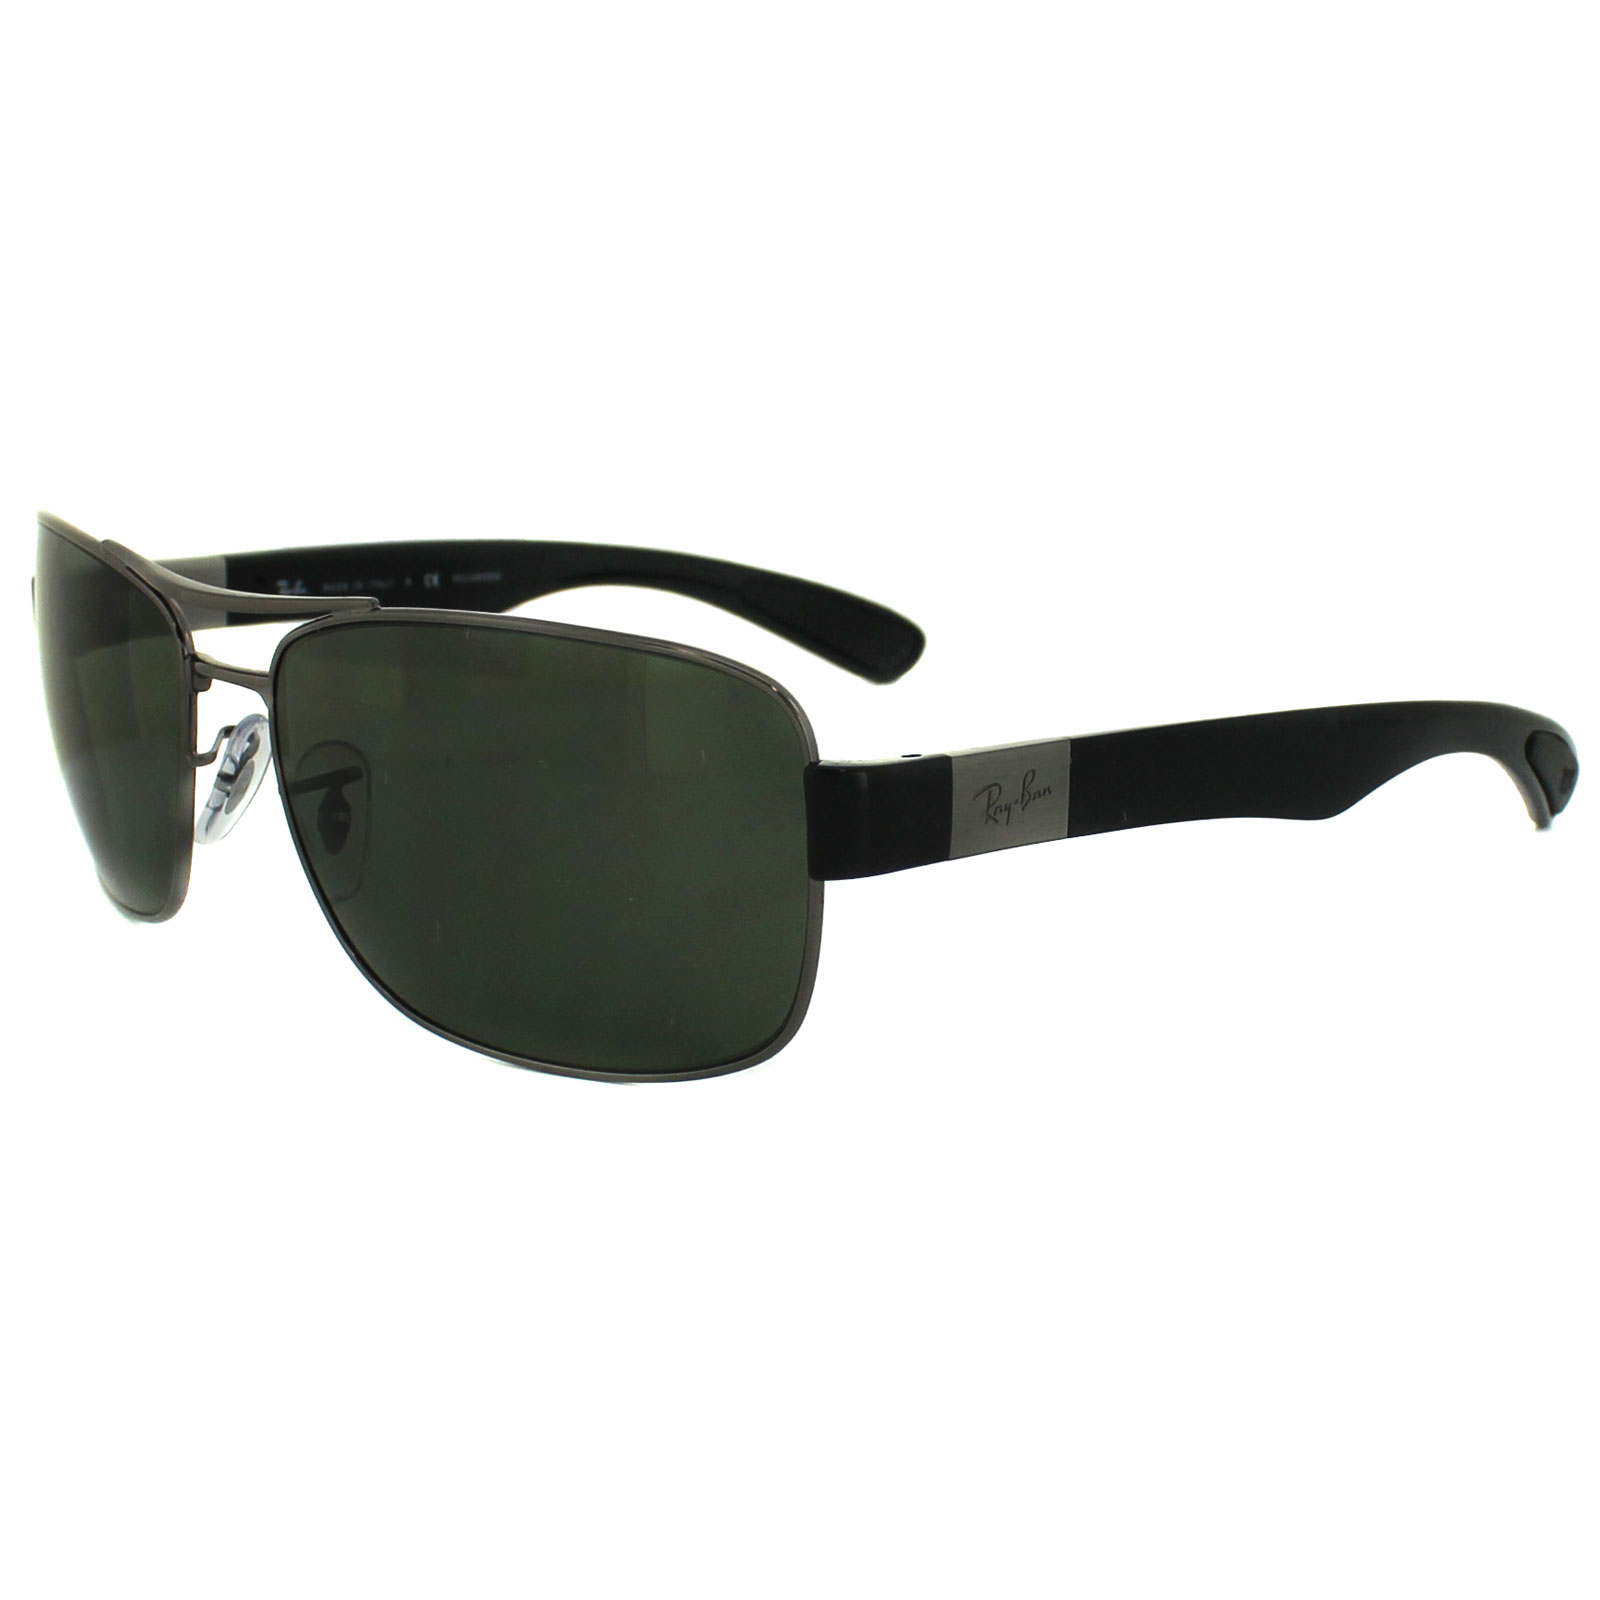 Cheap Ray Ban 3522 Sunglasses Discounted Sunglasses